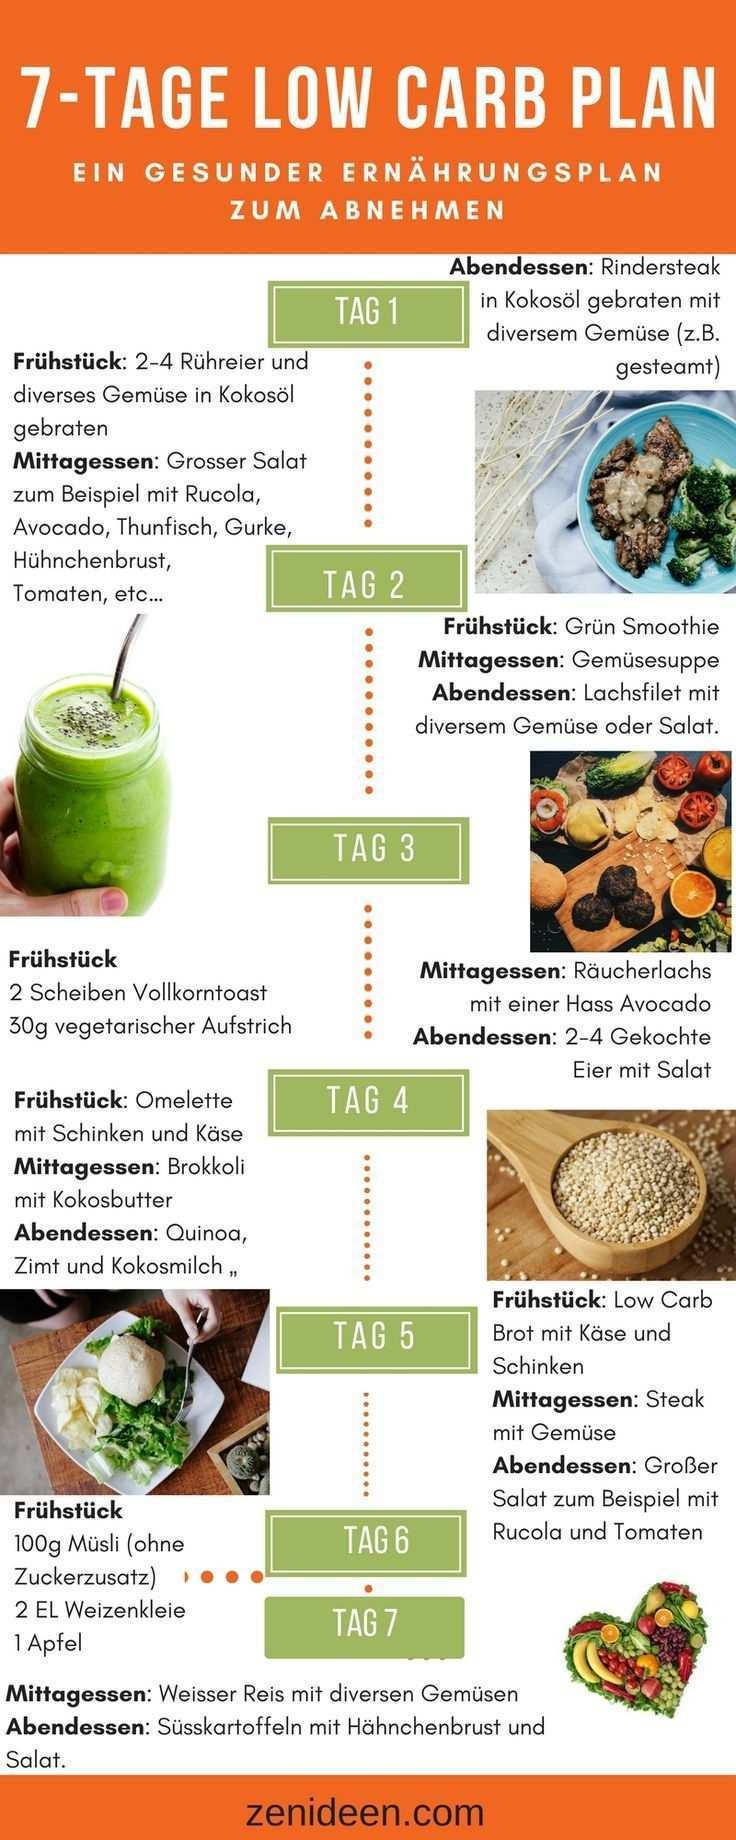 Gesunder Ernahrungsplan 7 Tage Low Carb Plan Zum Abnehmen Abnehmen Gesundheit Zenideen Gesunder Ernahrungsplan Ernahrung Ernahrungsplan Abnehmen